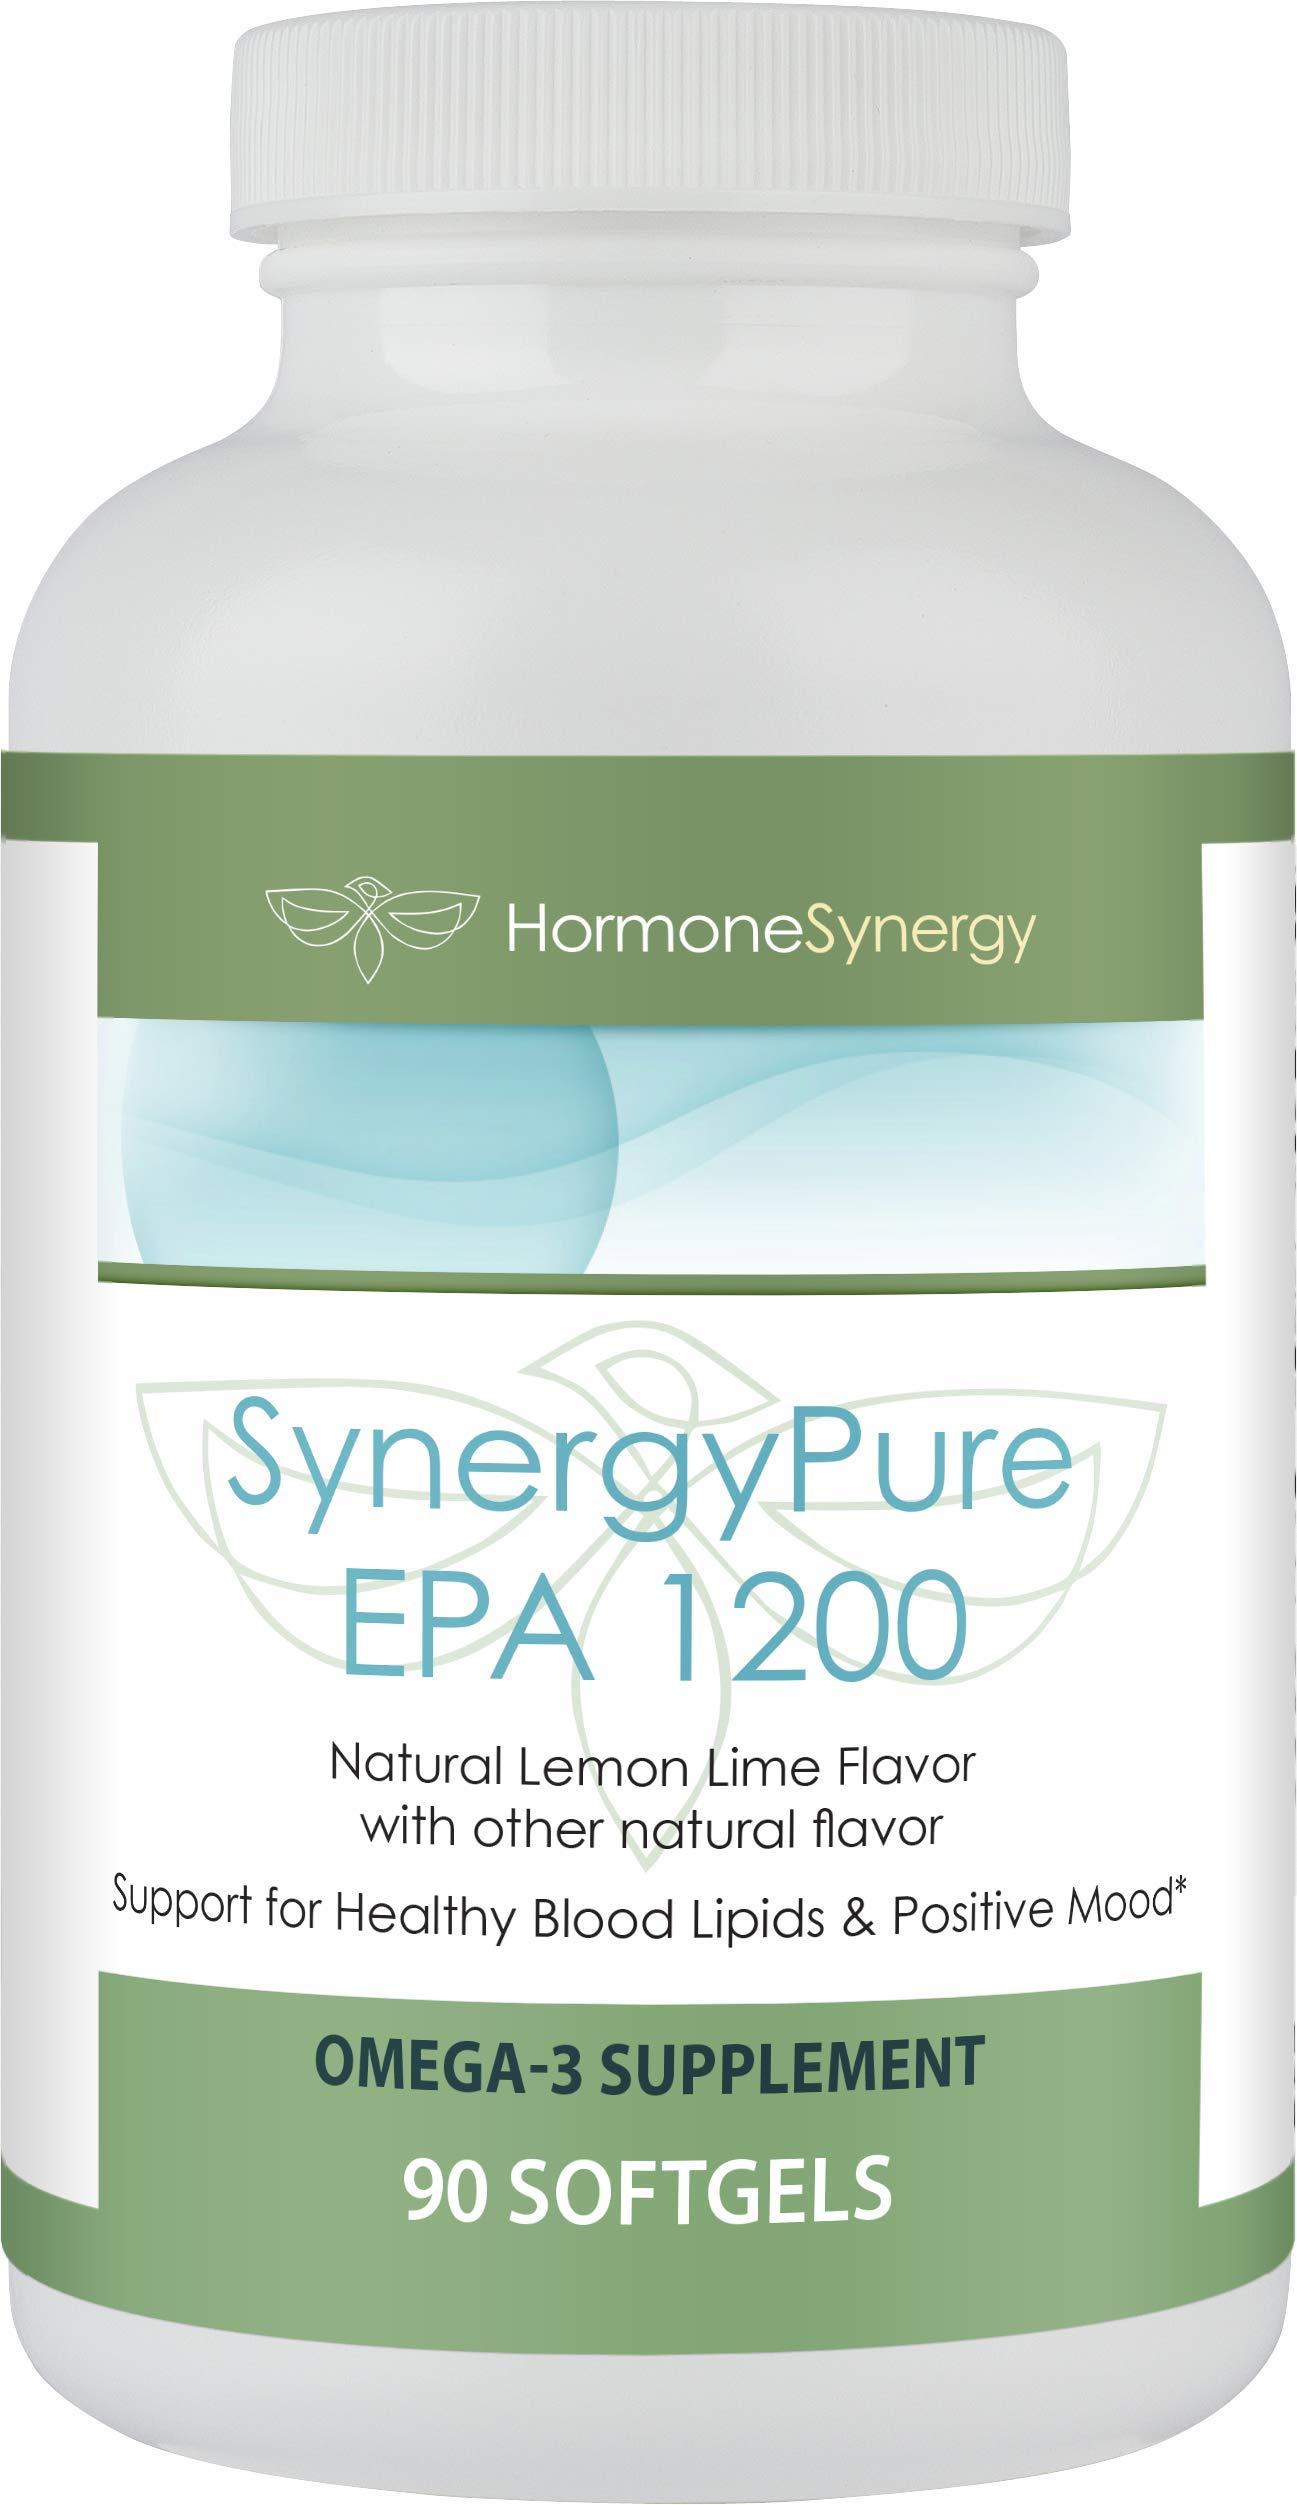 SynergyPure EPA Fish Oil 1200 mg. EPA PER SOFTGEL | 90 ea | Each softgel Provides a Total of 1200 mg of EPA by HormoneSynergy